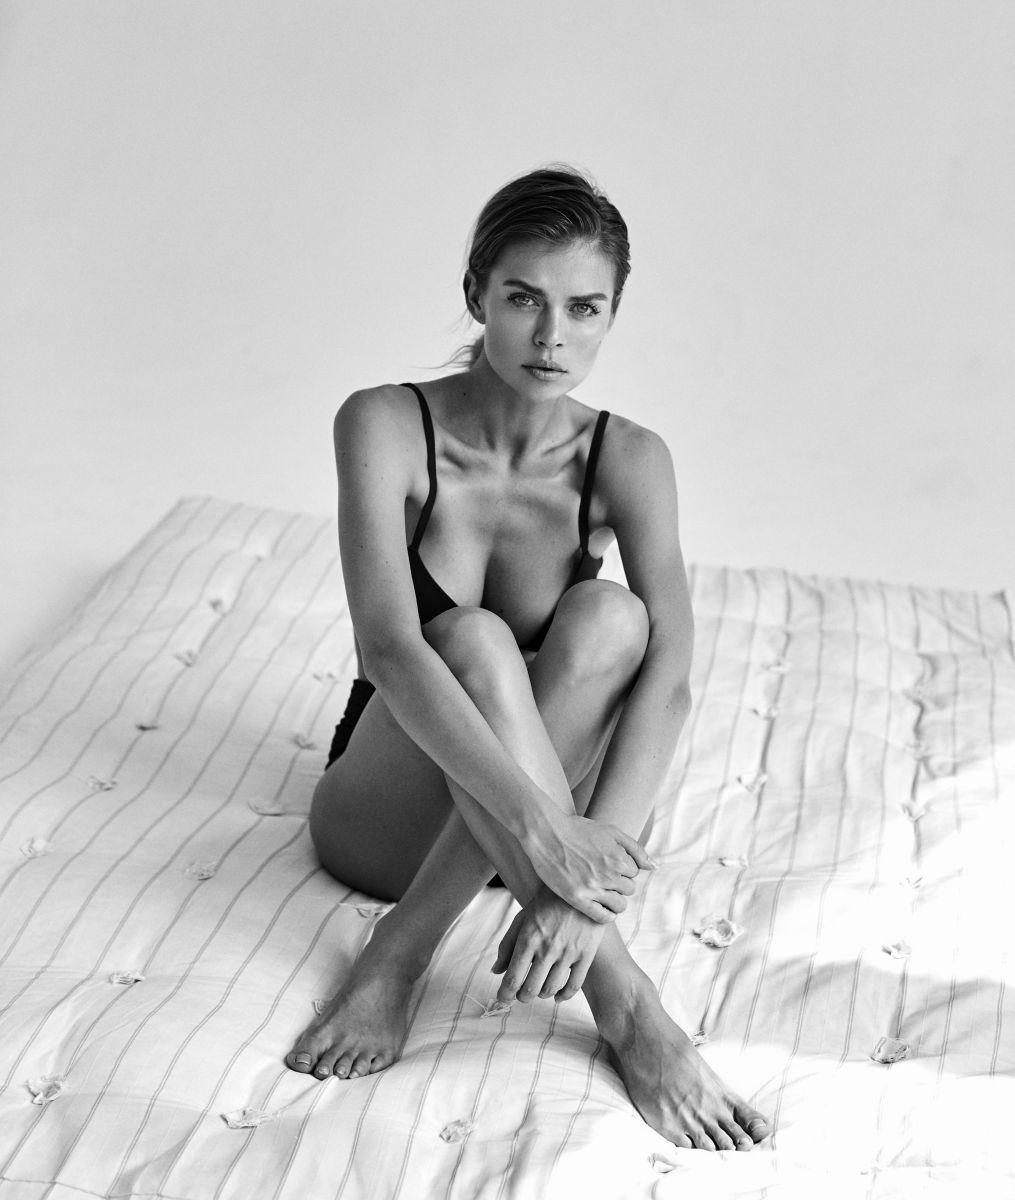 Balistarz-model-Olesya-Z-black-white-portrait-shoot-on-bed-with-black-clothes